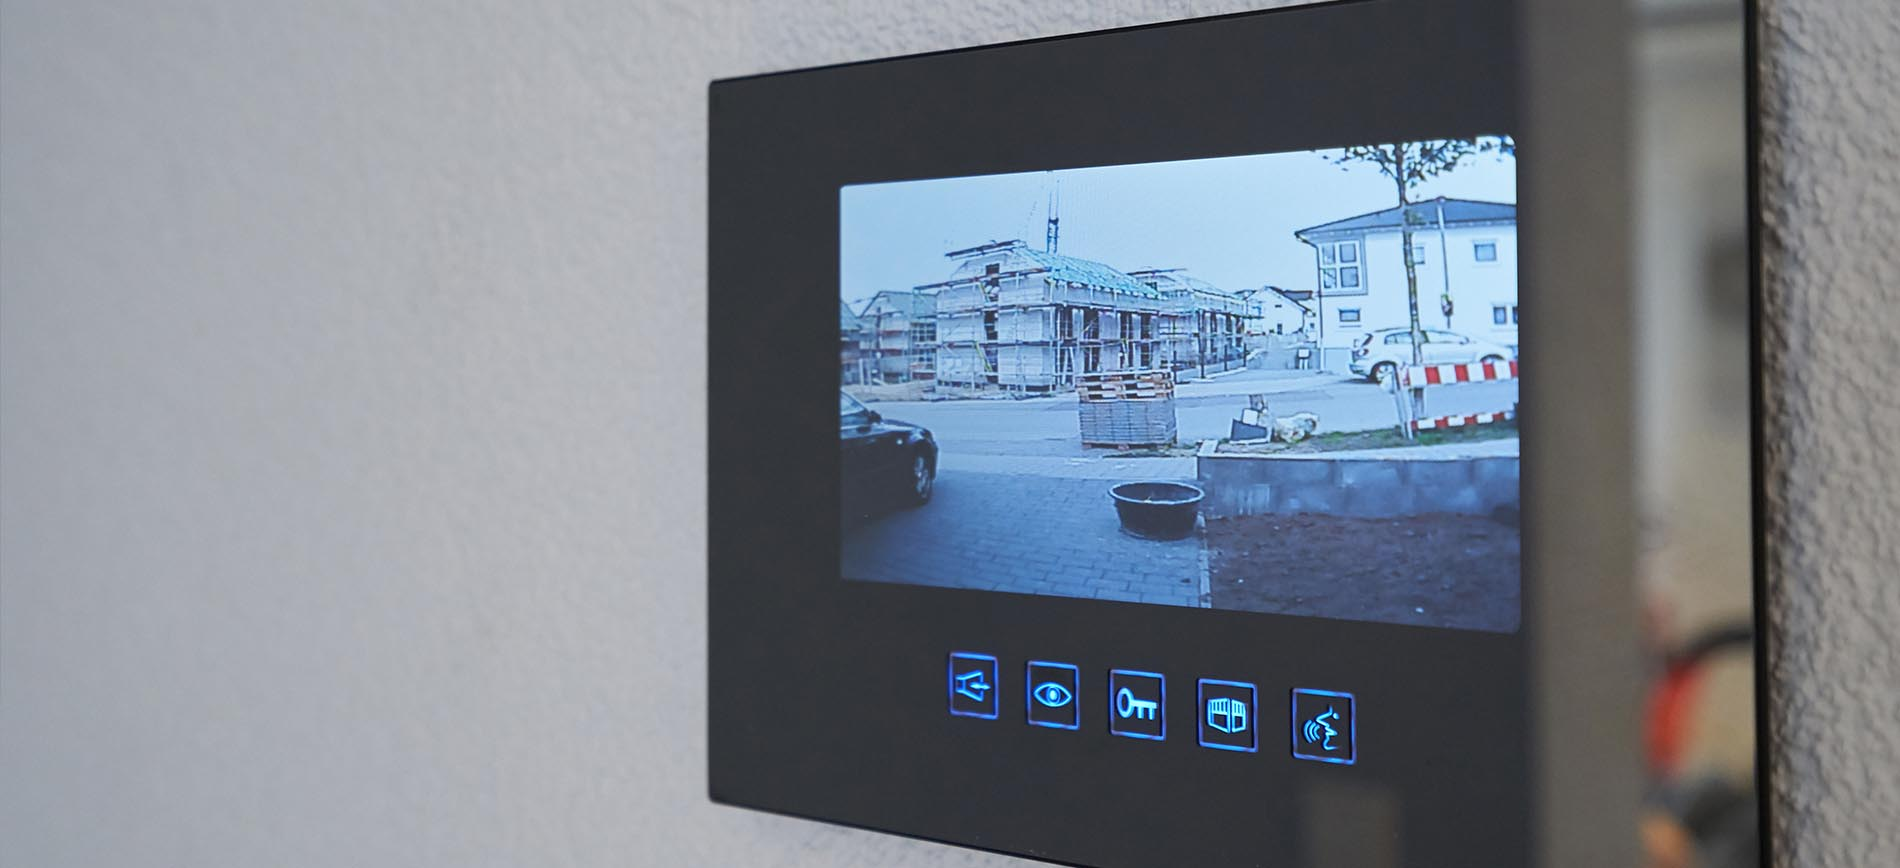 Image of a video intercom system